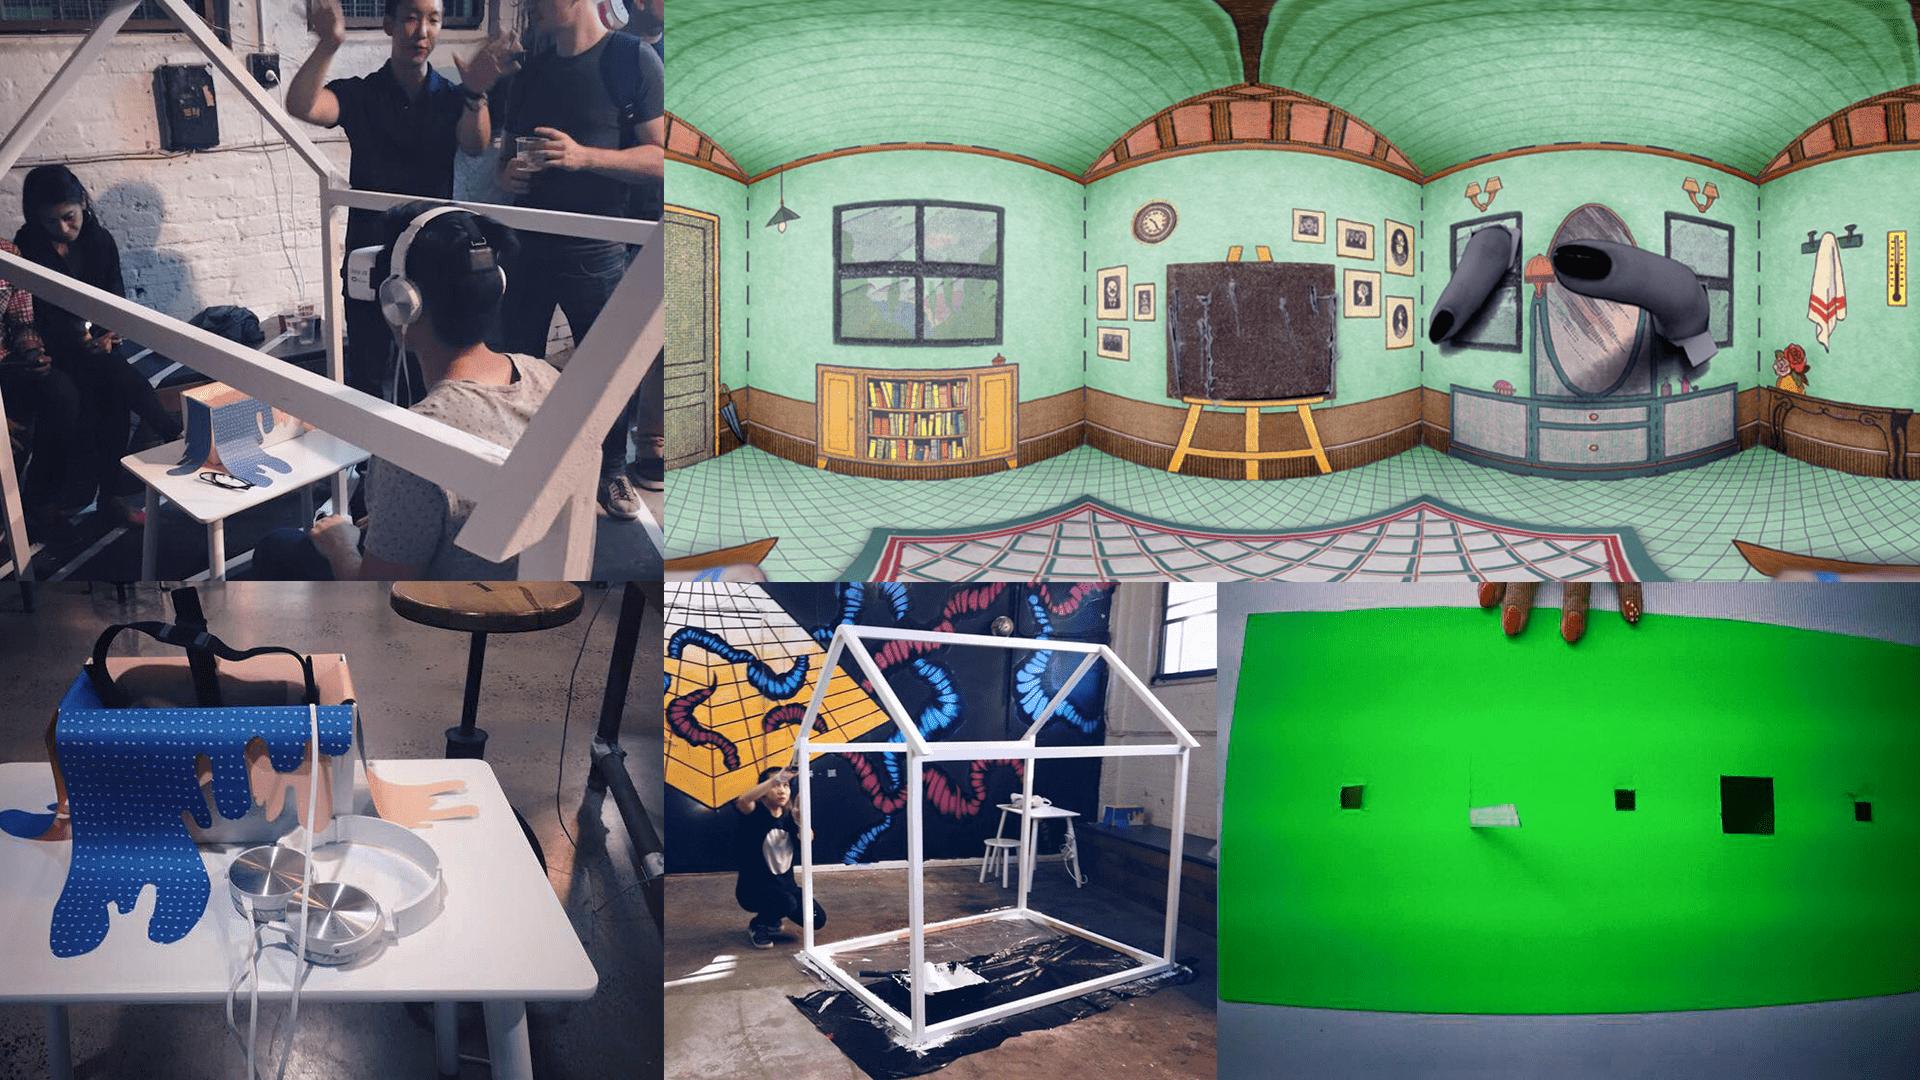 Virtual Reality Moonbook